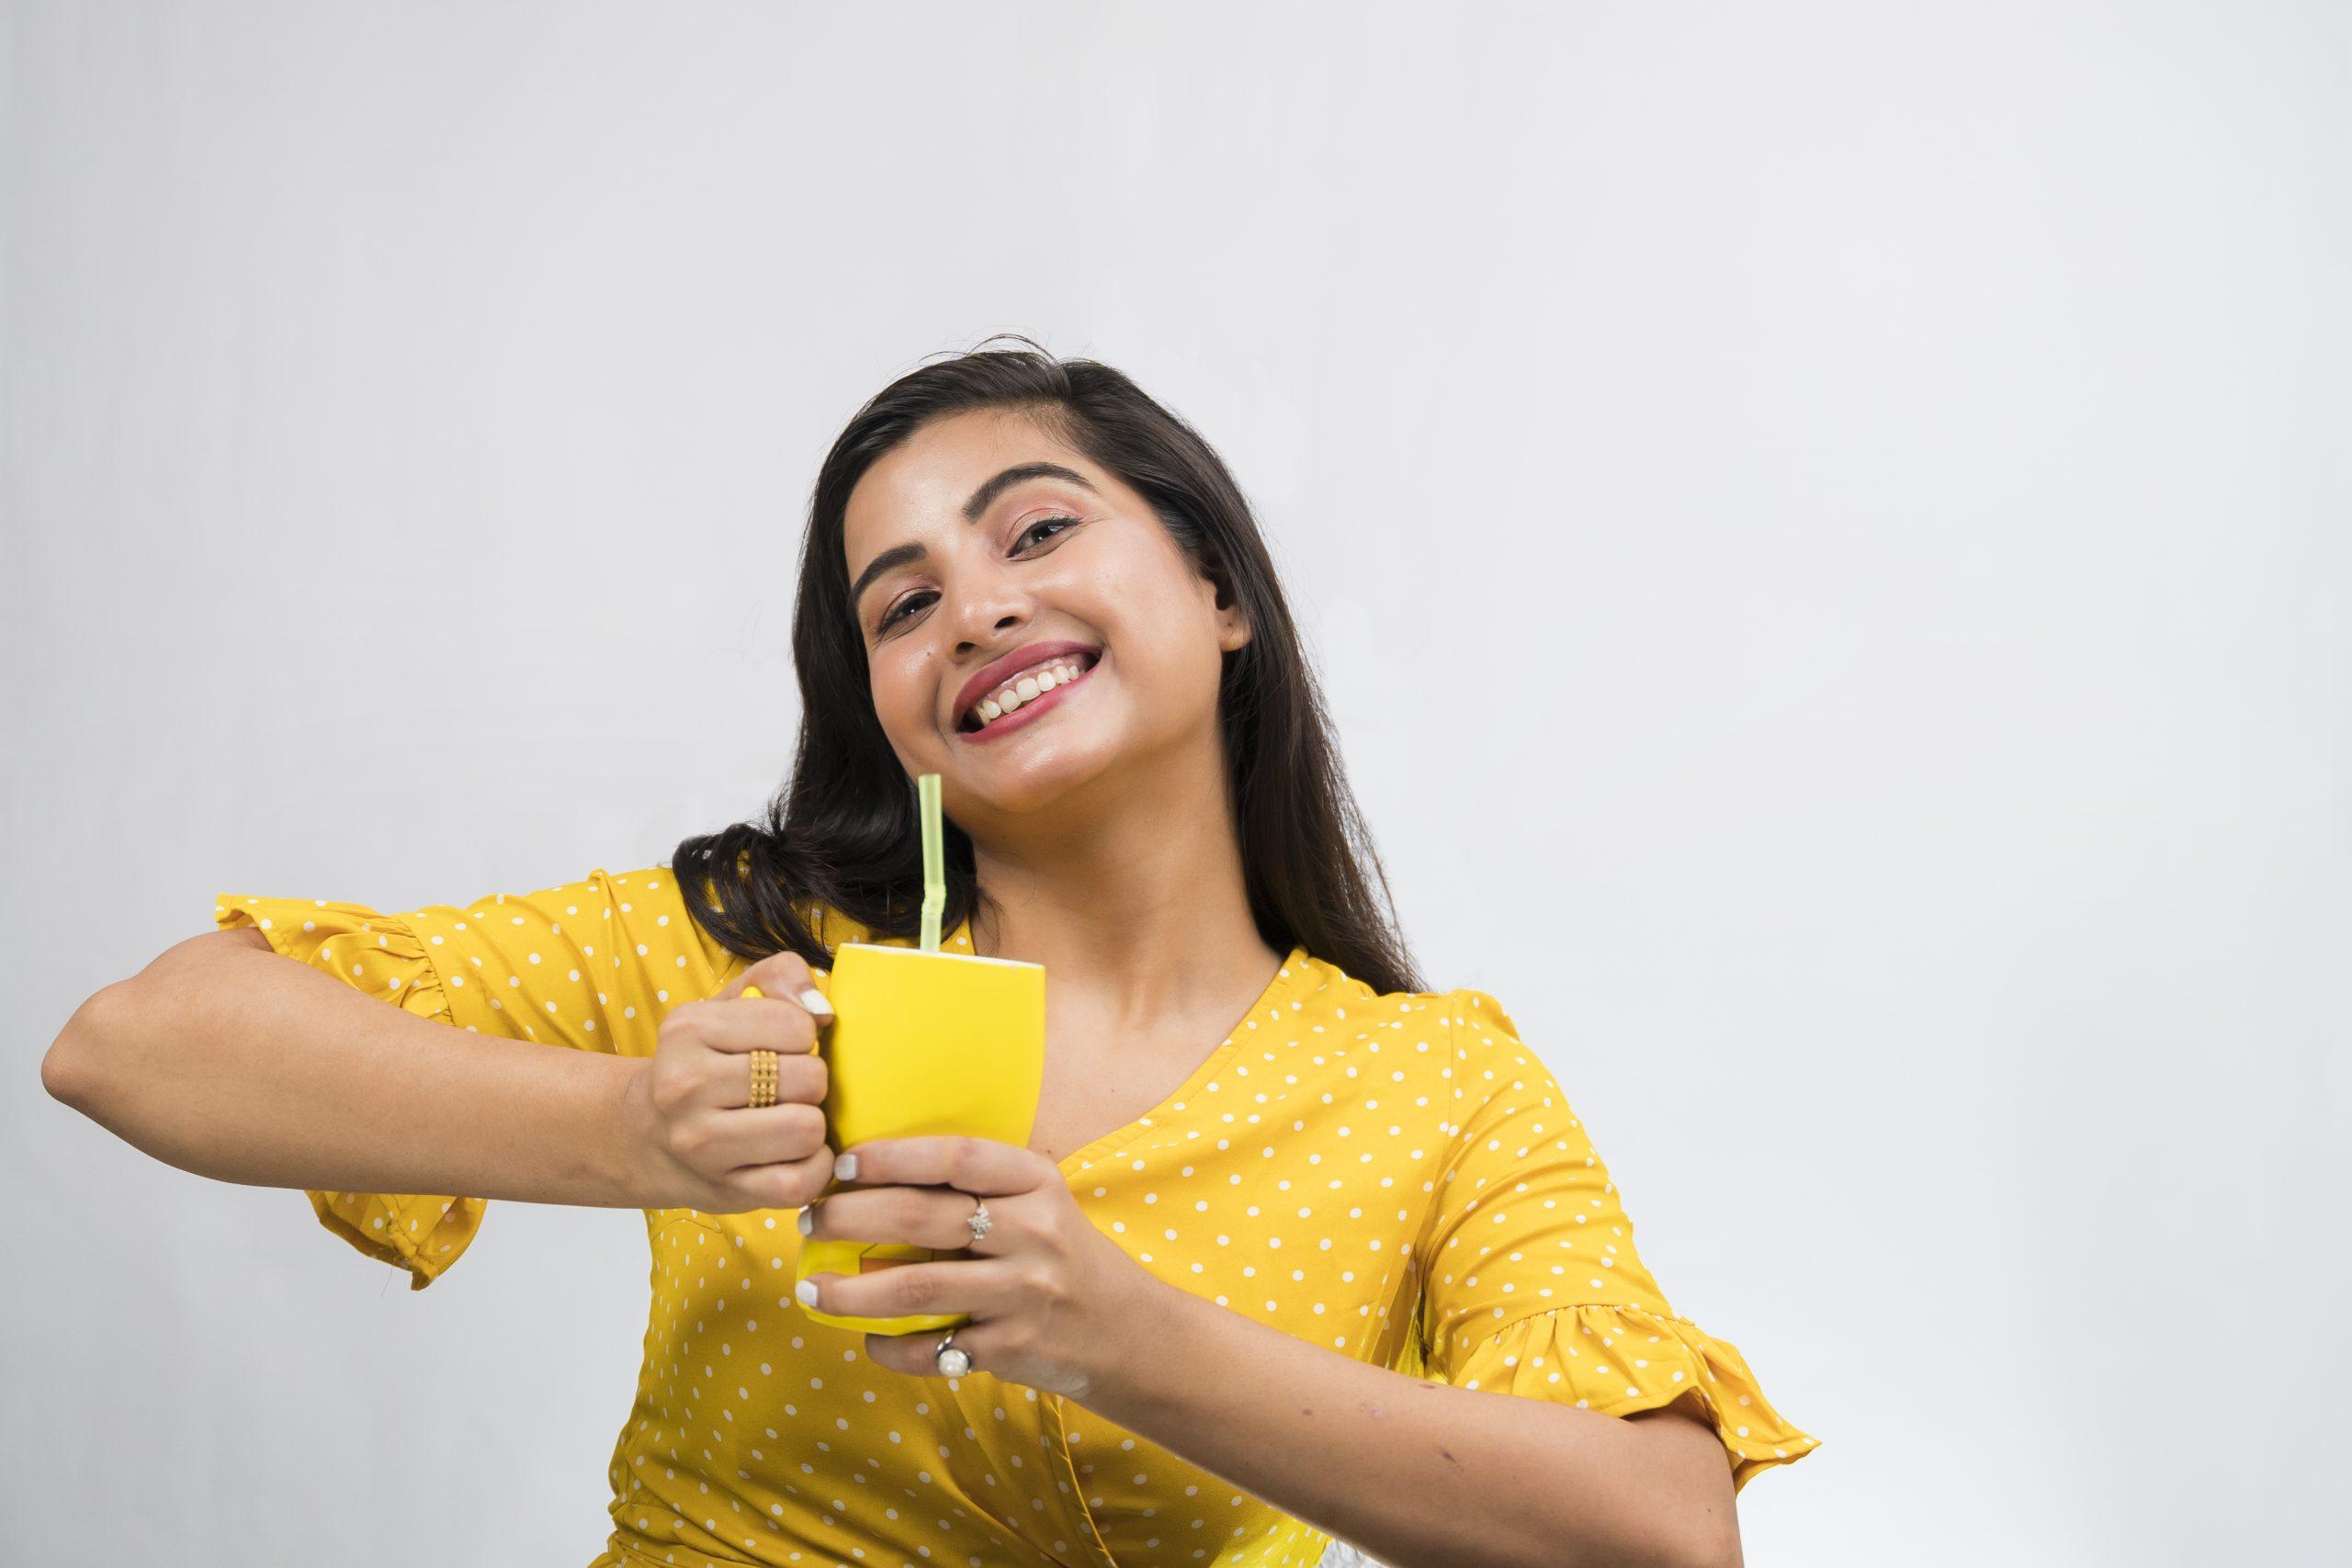 Indian girl posing with mug